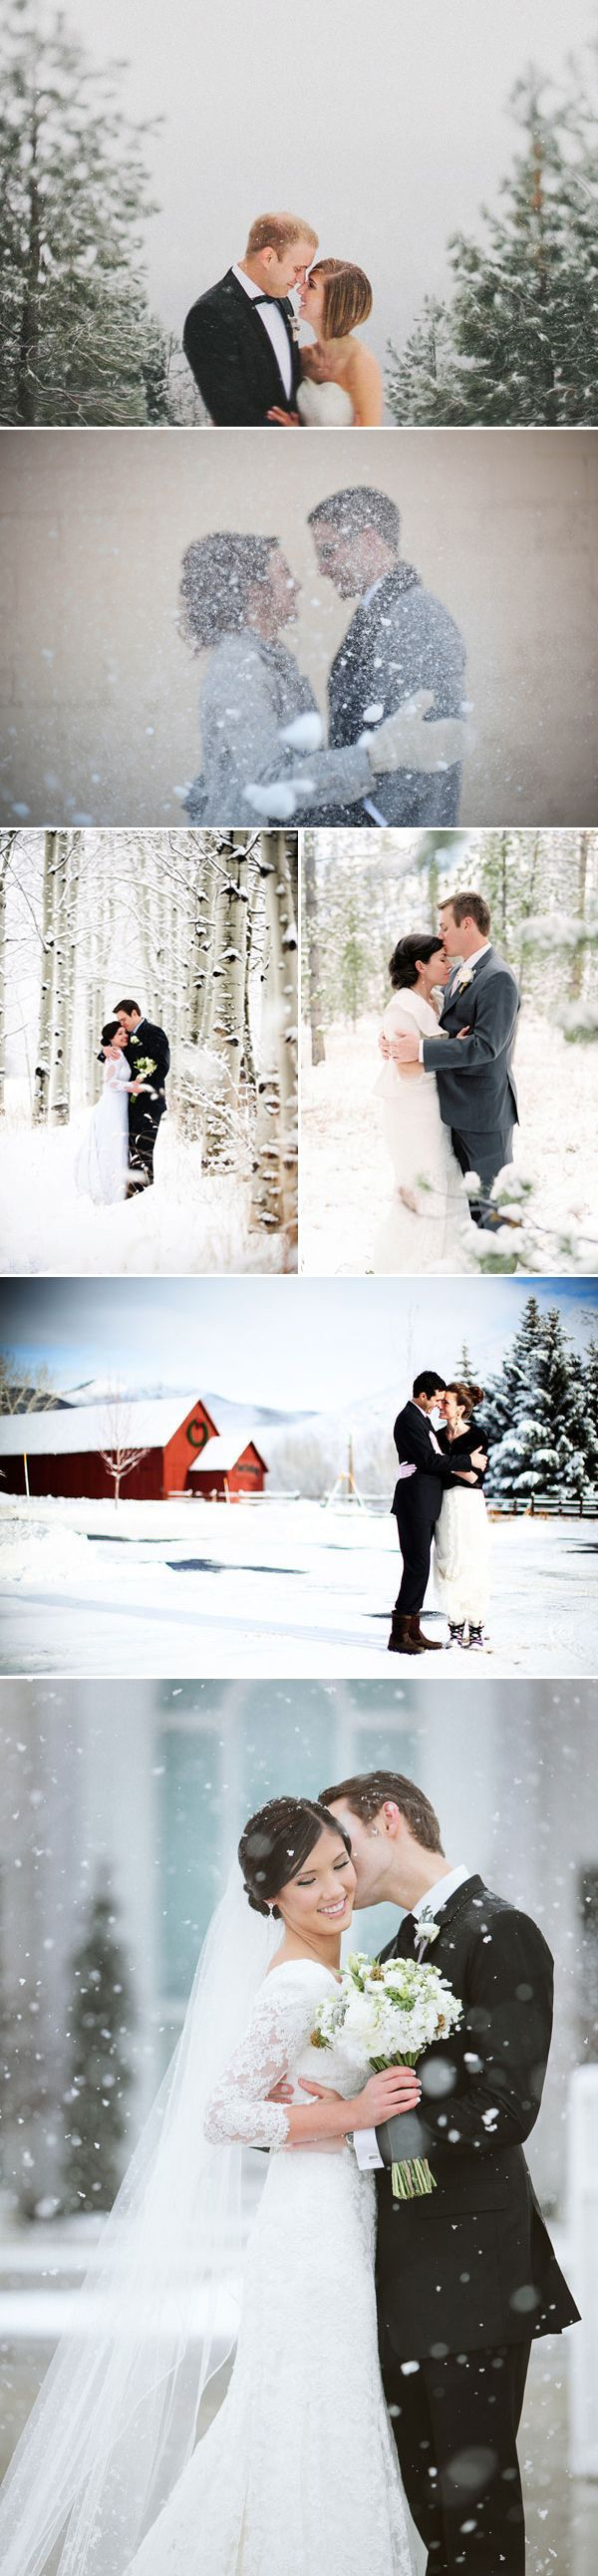 23 Dreamy Winter Wedding Photos